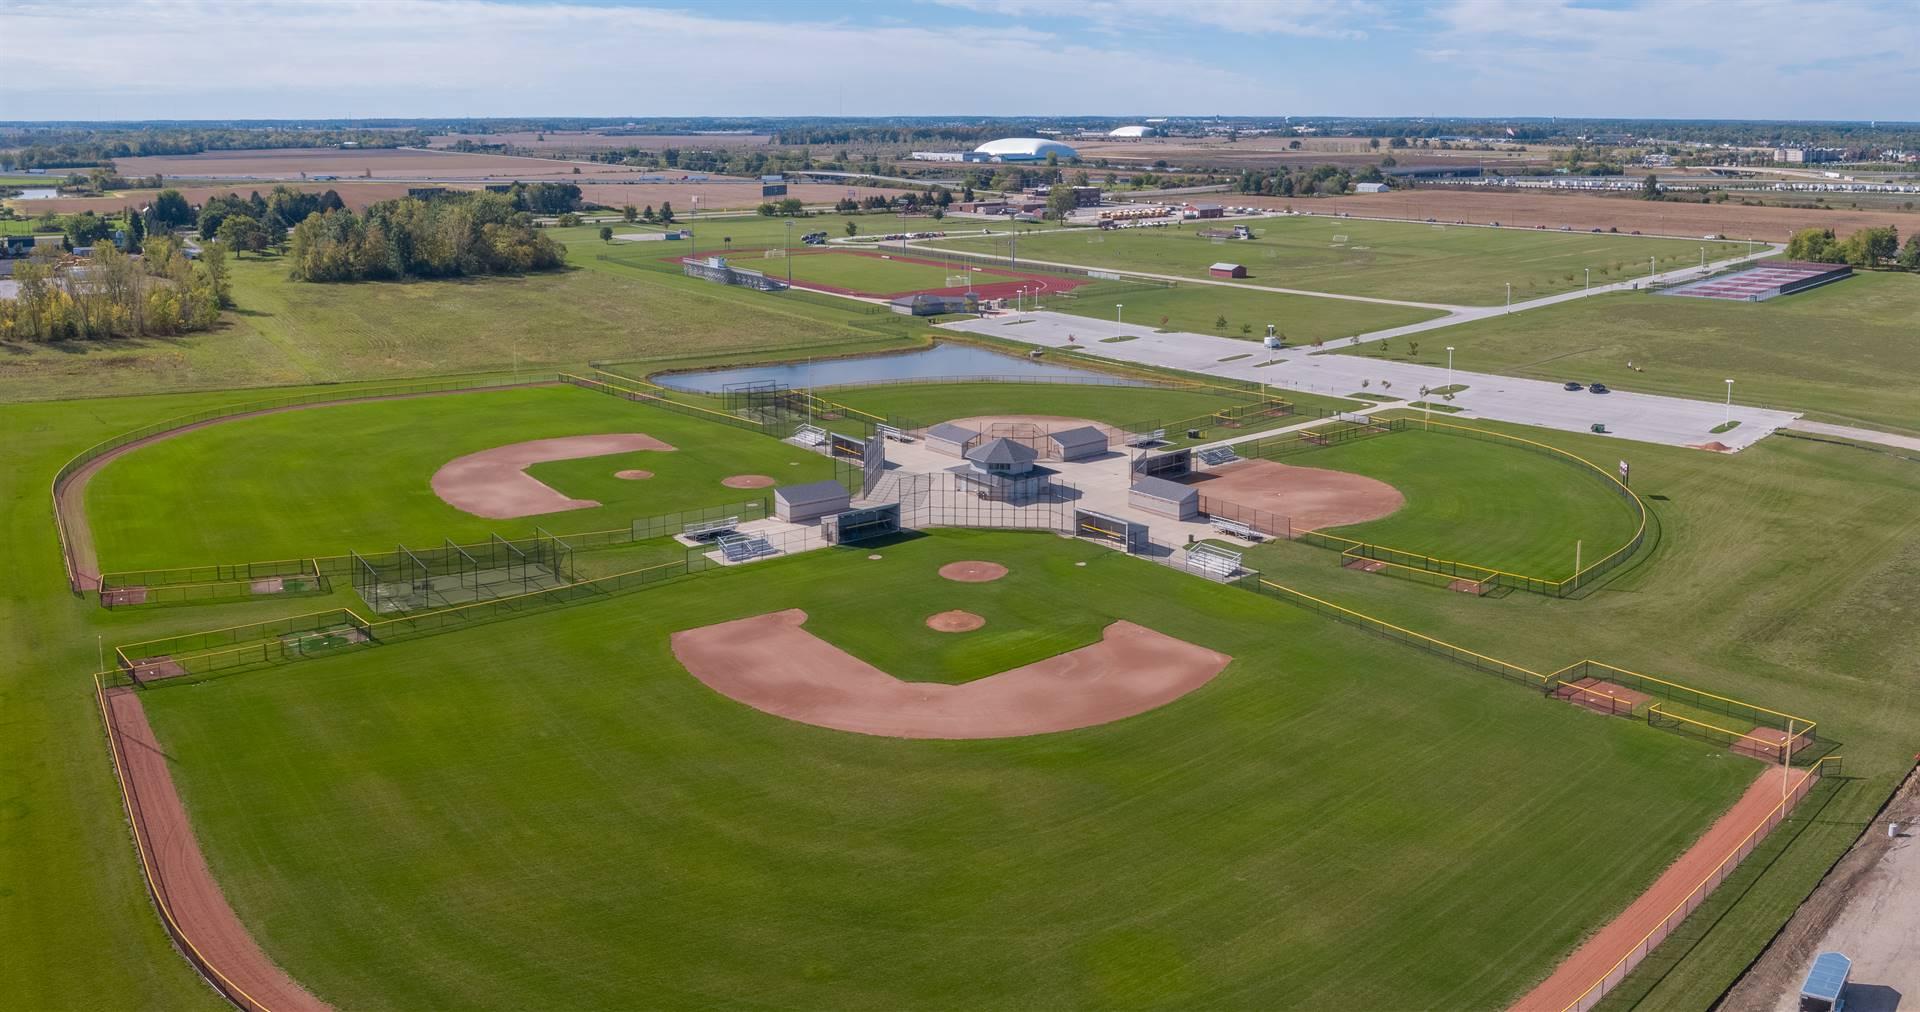 Aerial photo of baseball and softball fields